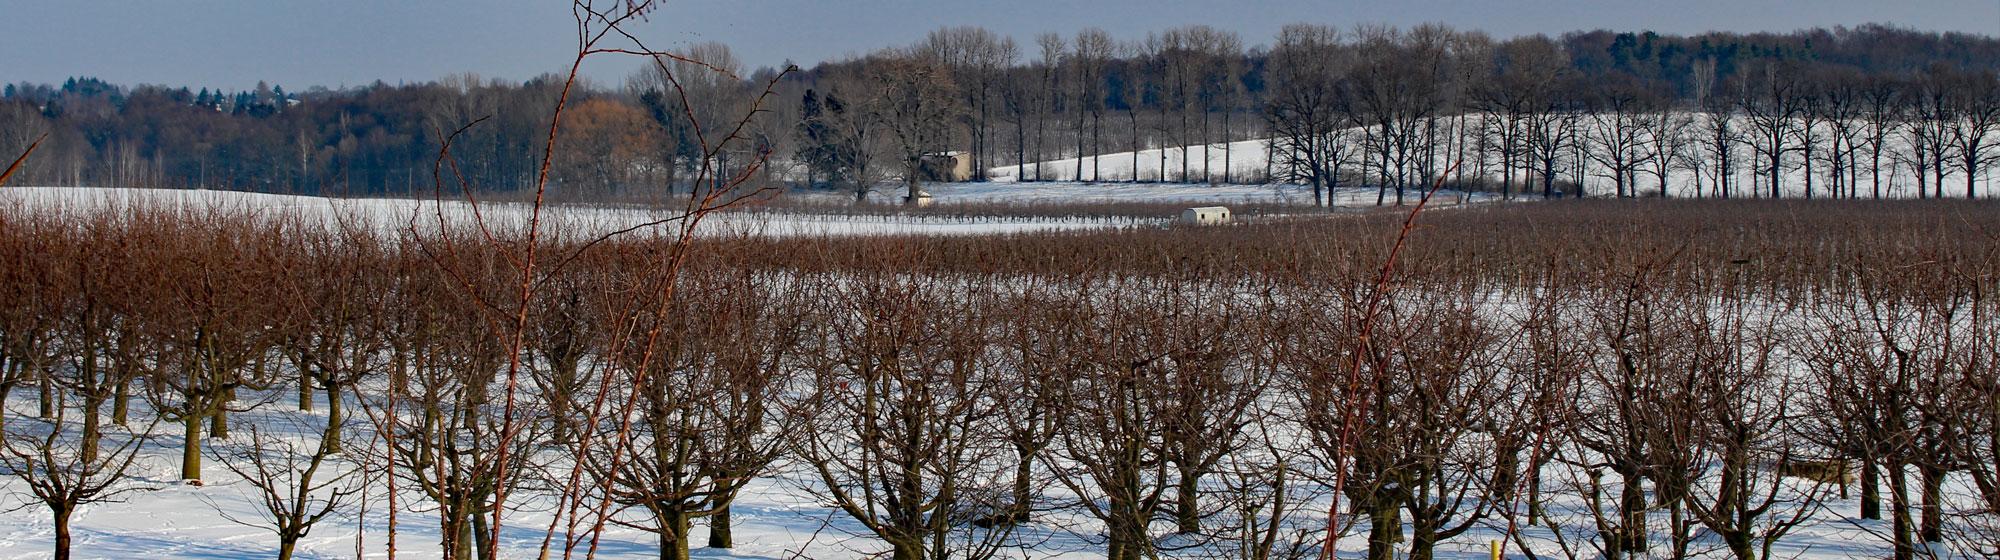 Stadtgut Görlitz Winter-Apfelanlage.jpg